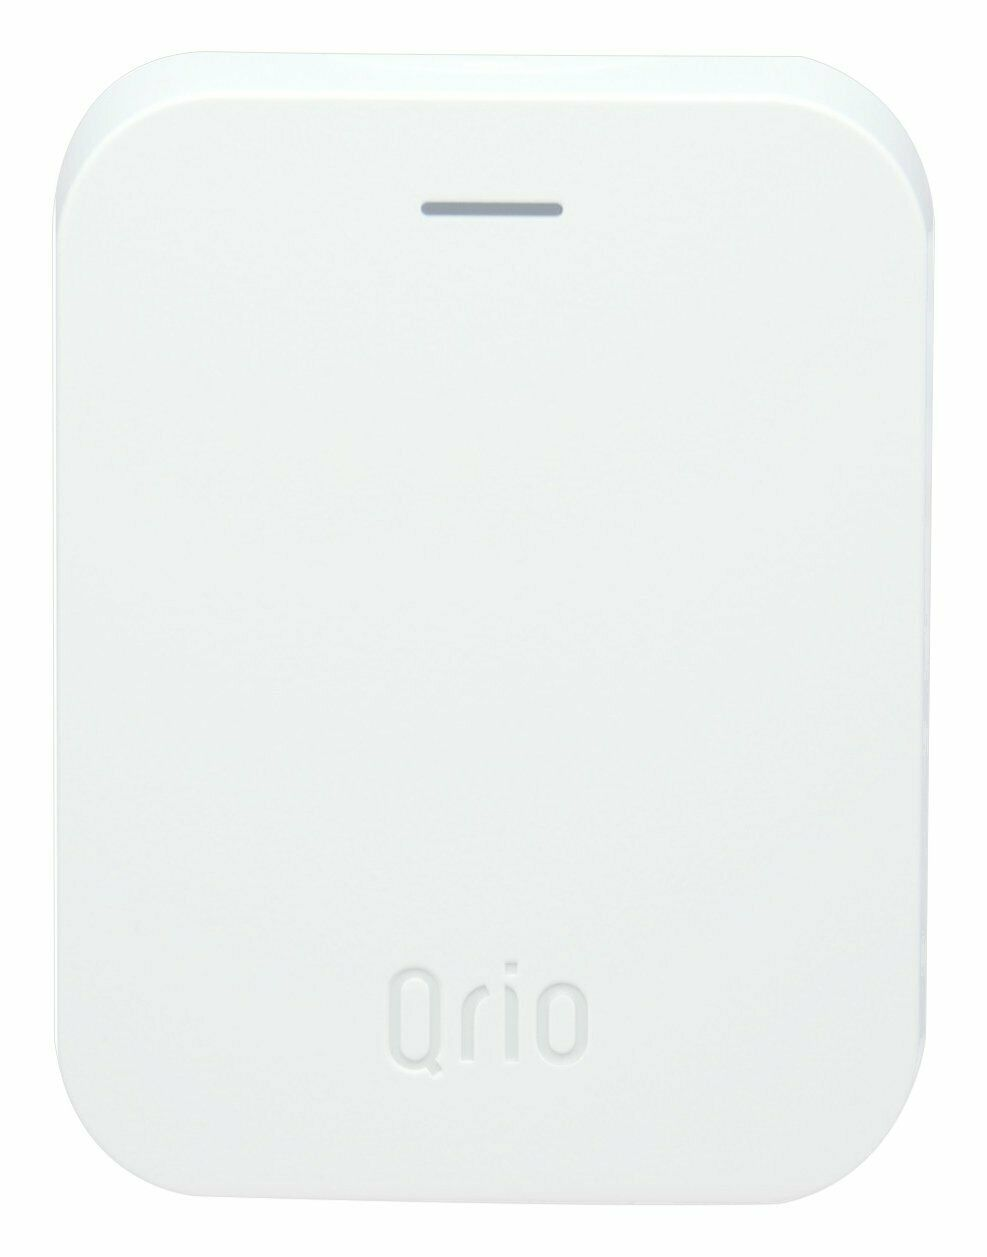 Qrio Hub Remote operation key of home Removable smartphone Q-H1